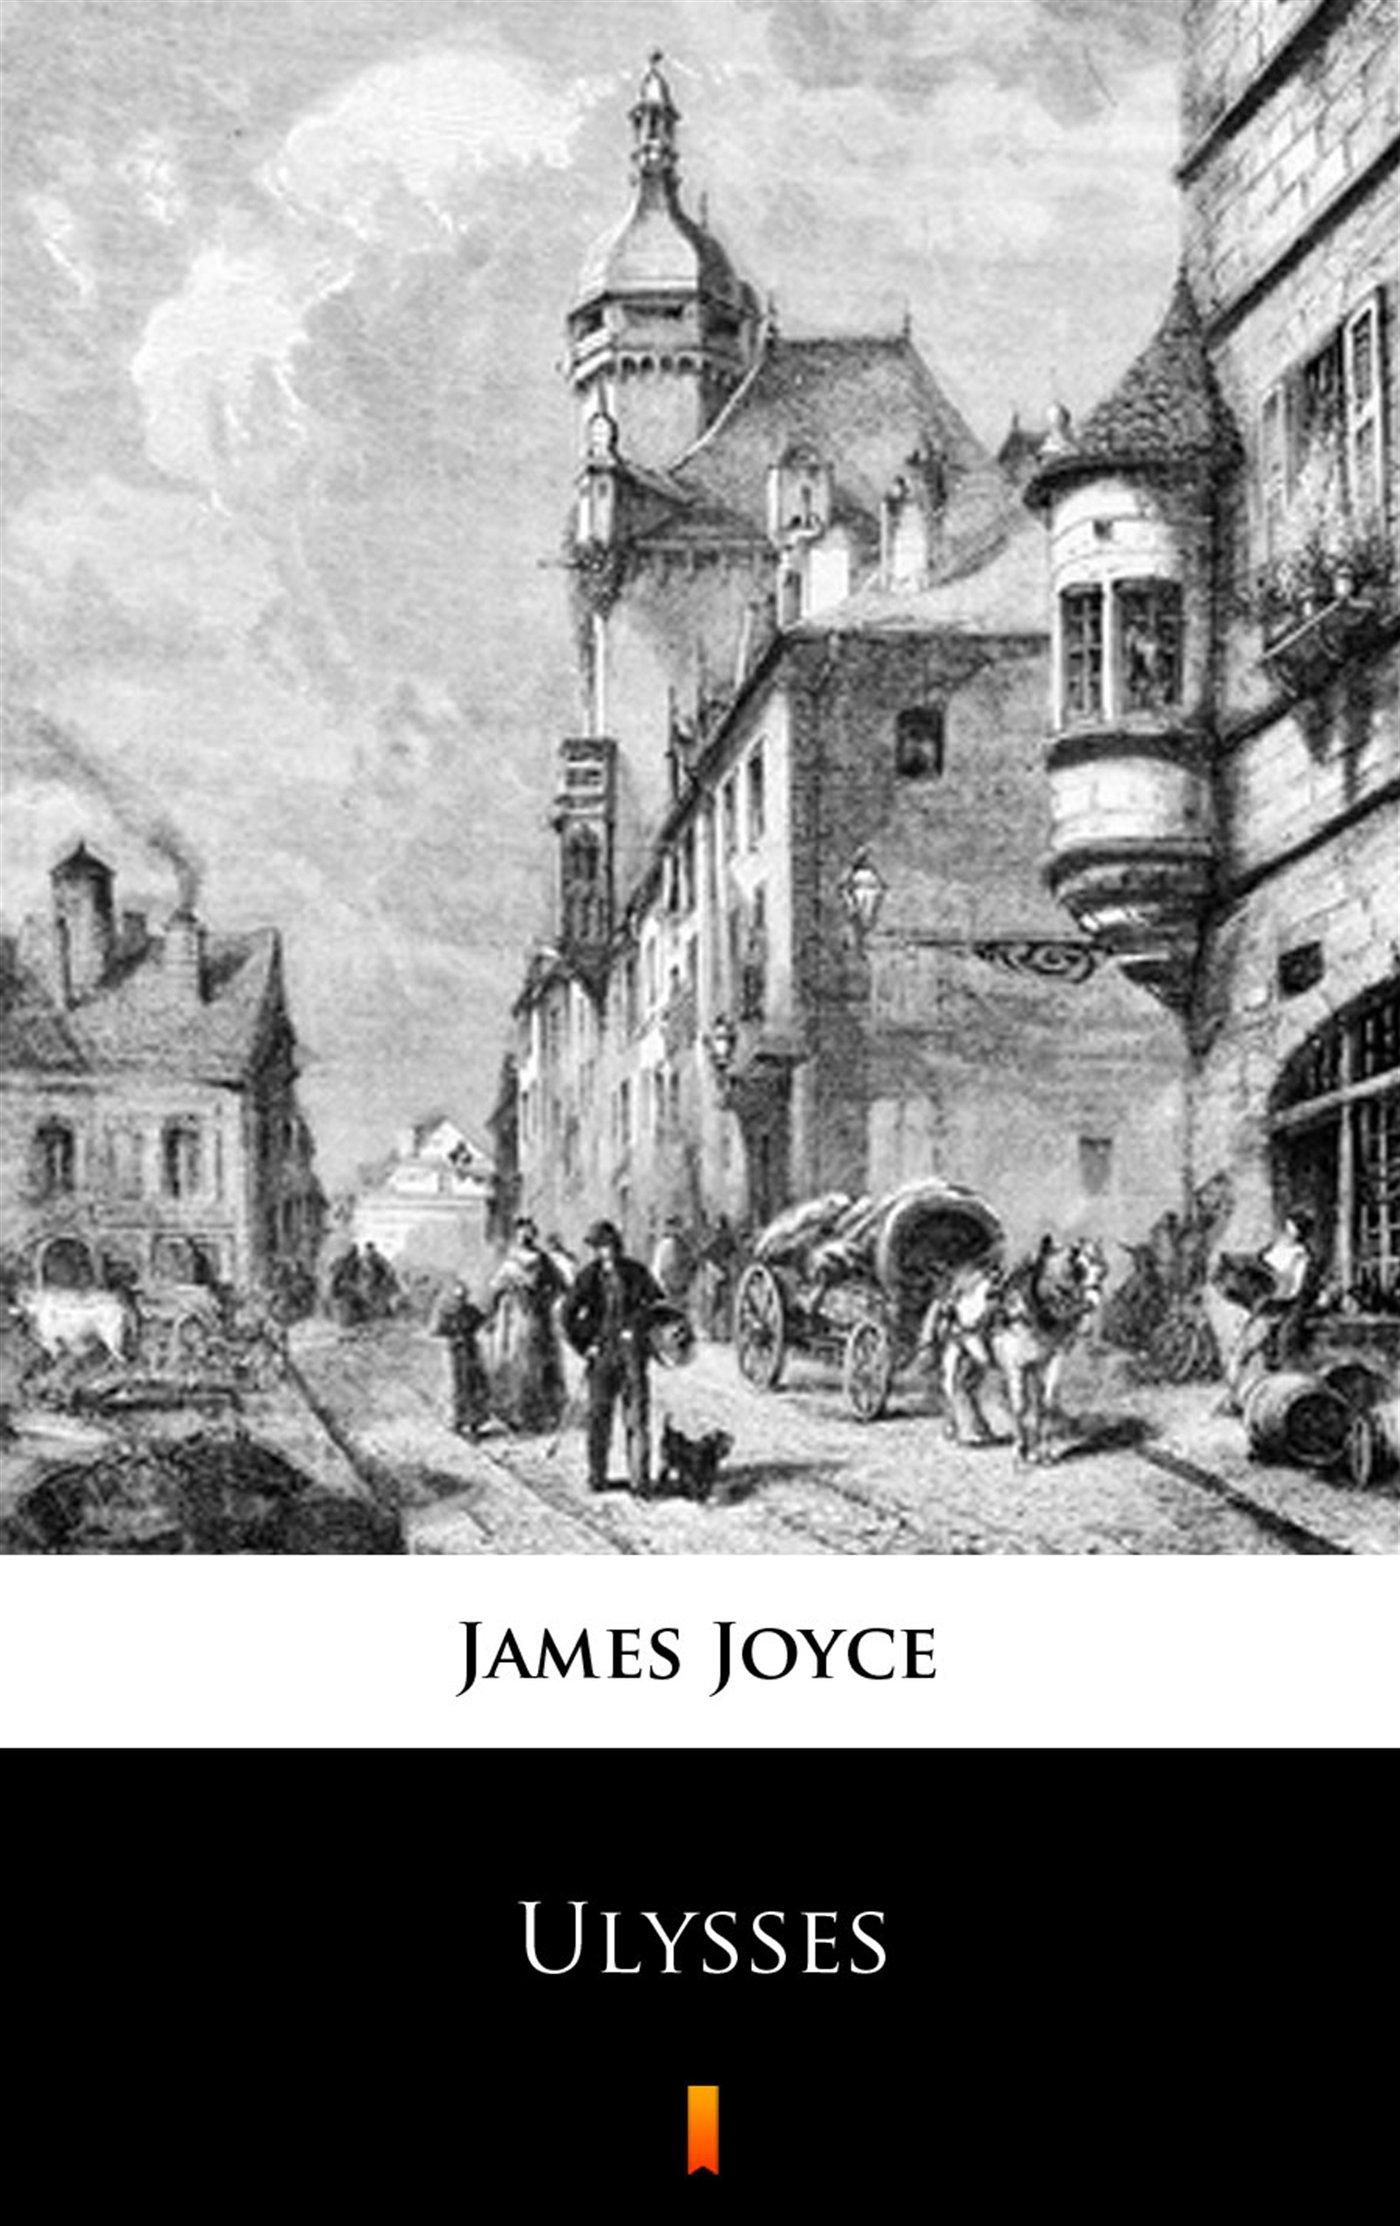 Ulysses - Ebook (Książka na Kindle) do pobrania w formacie MOBI